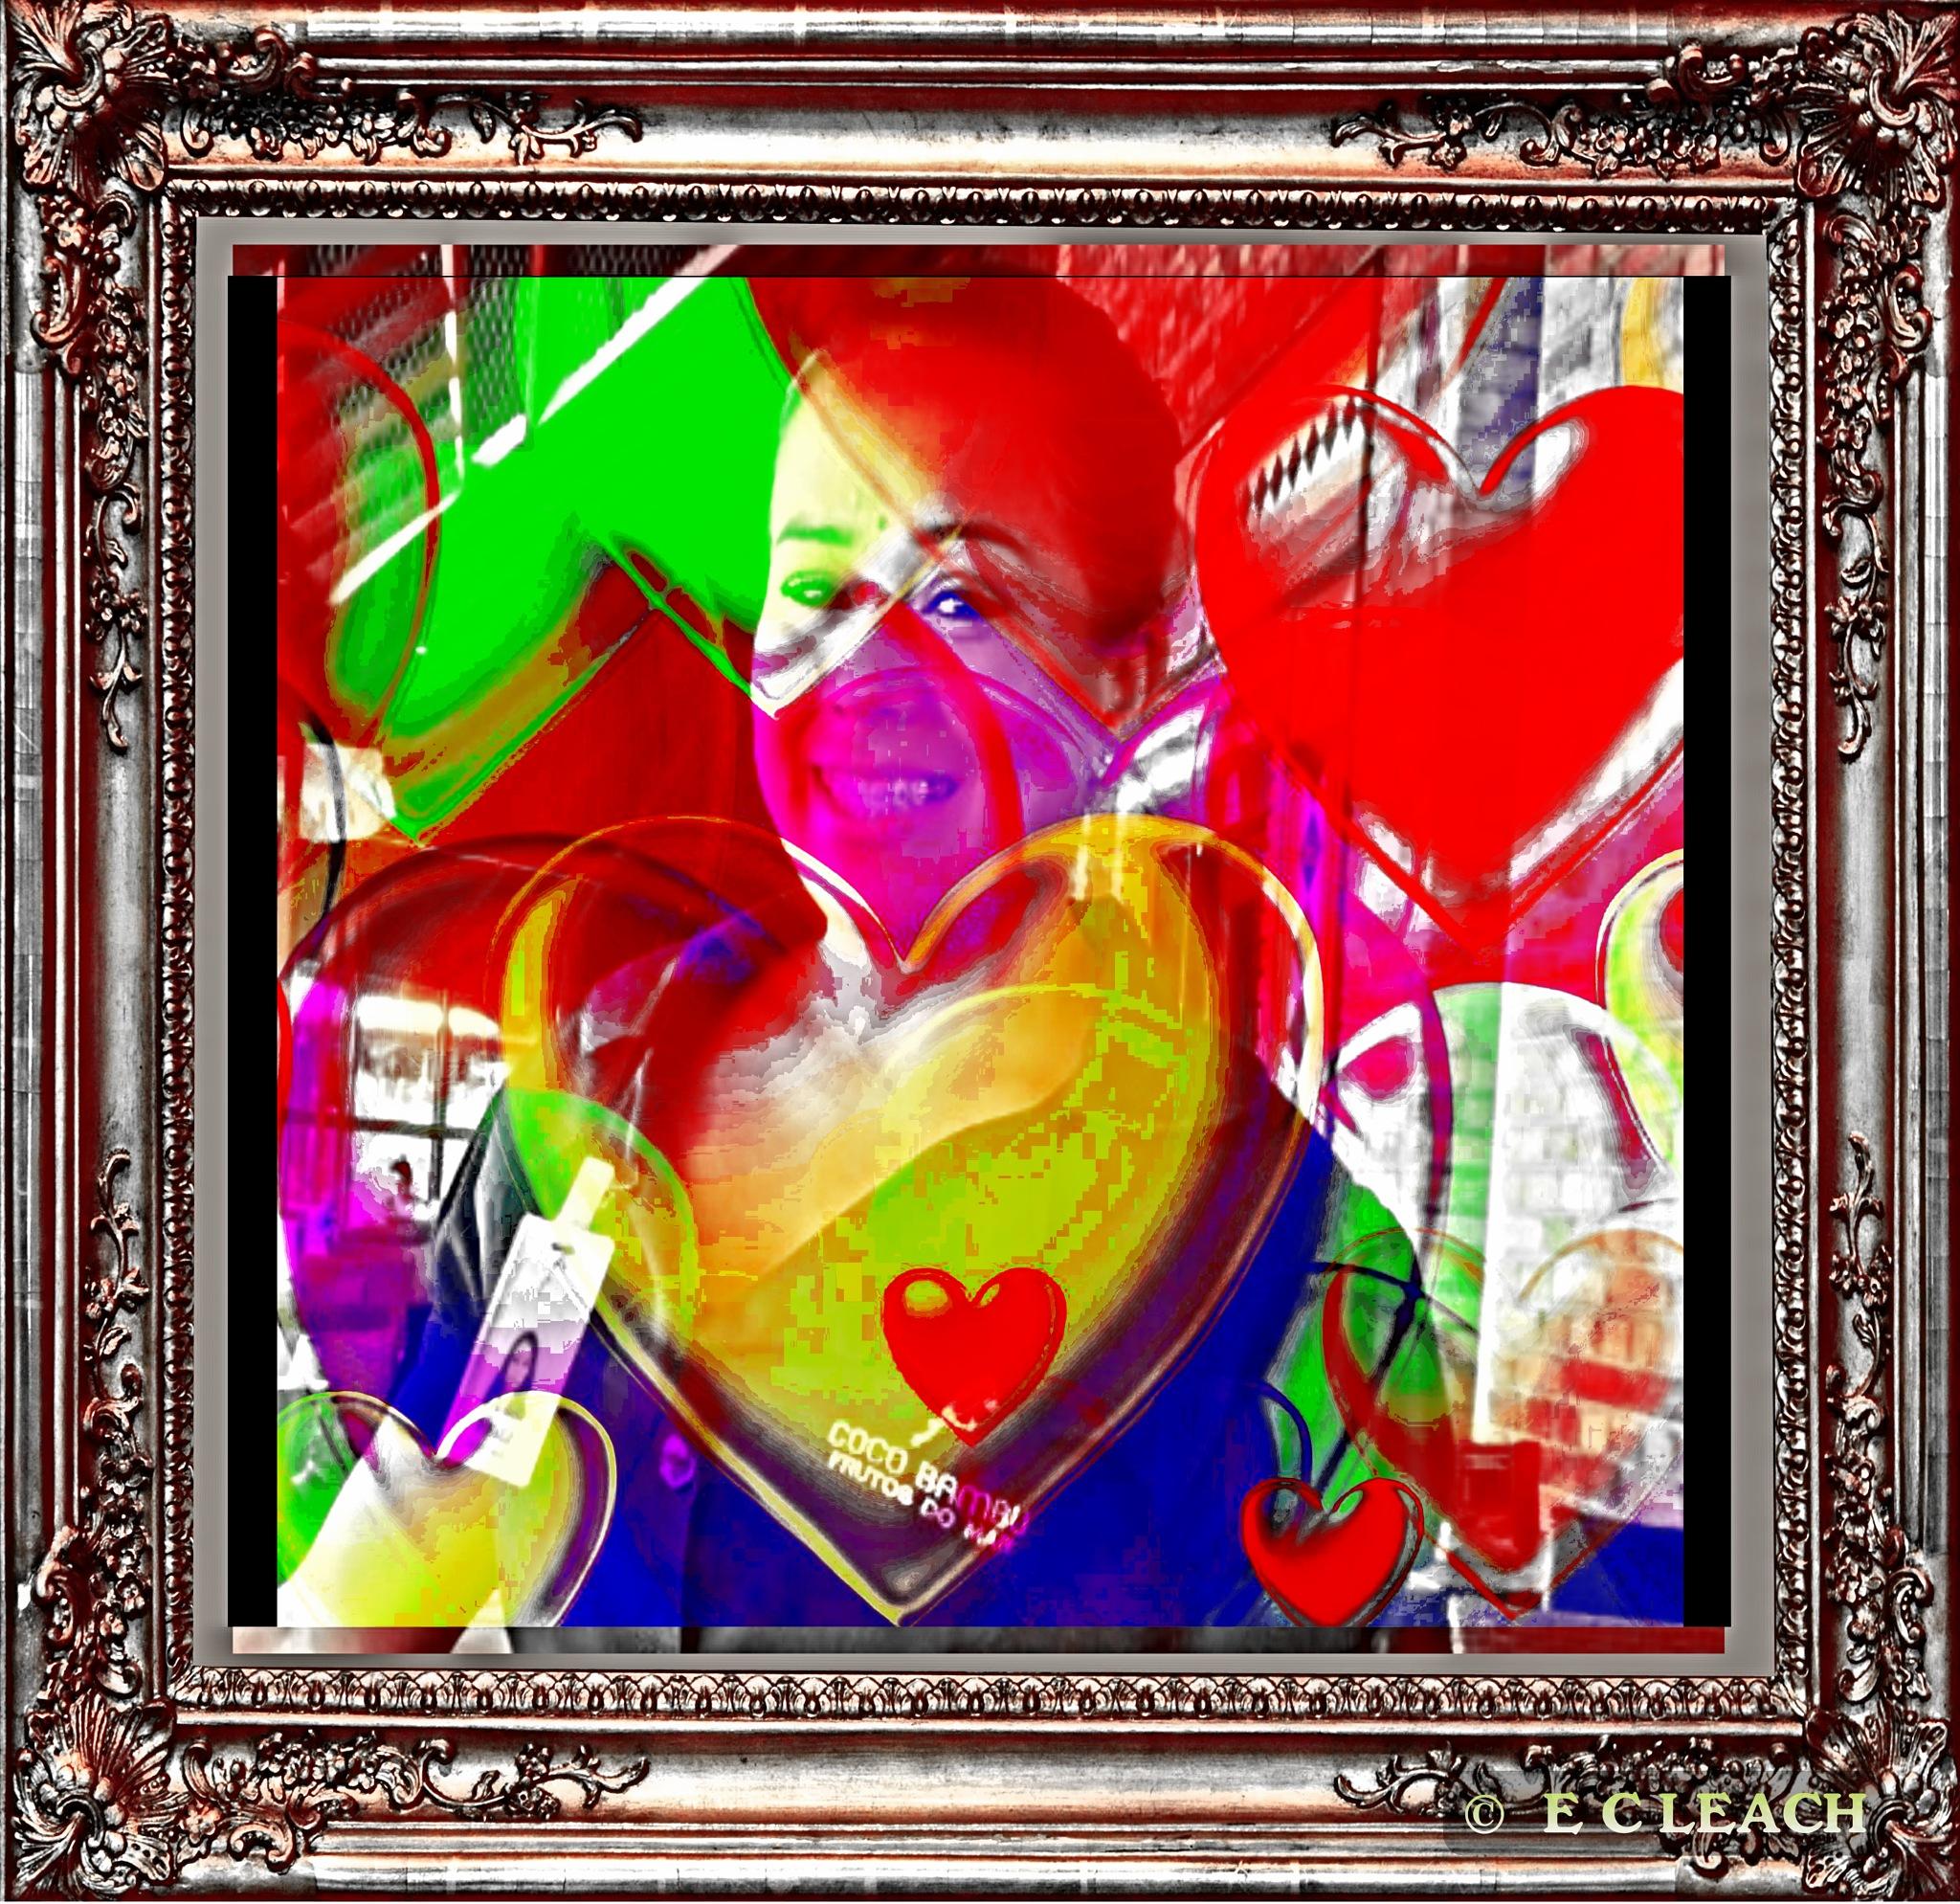 Queen of Hearts by Elmer Leach